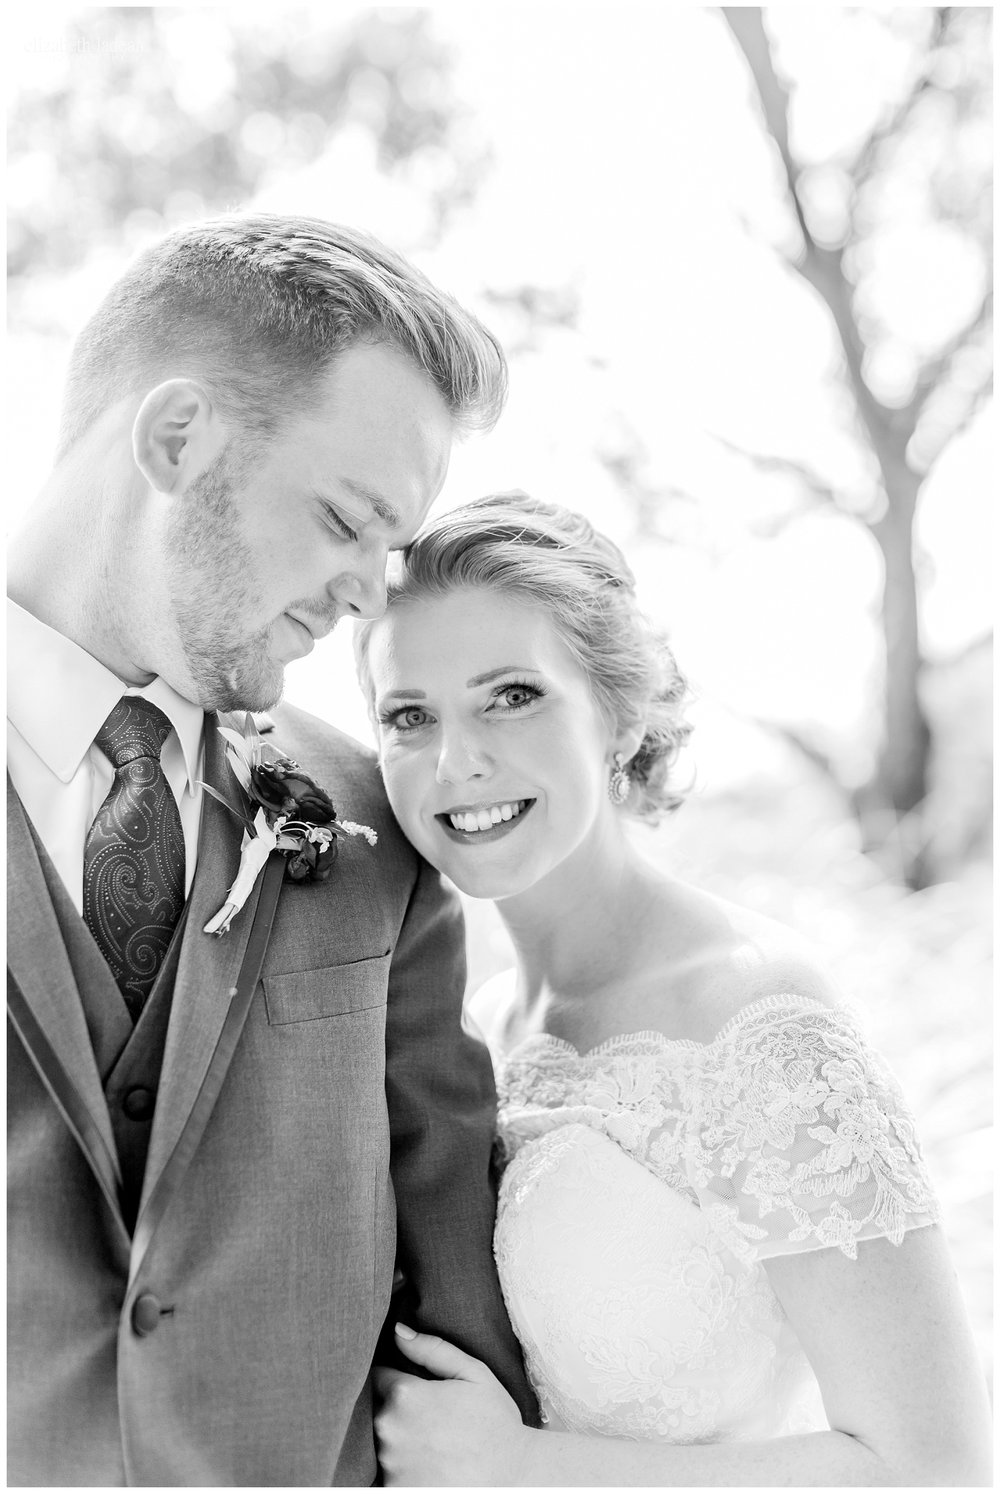 Kansas-City-KC-Wedding-Photographer-2017BestOf-Elizabeth-Ladean-Photography-photo-_6000.jpg